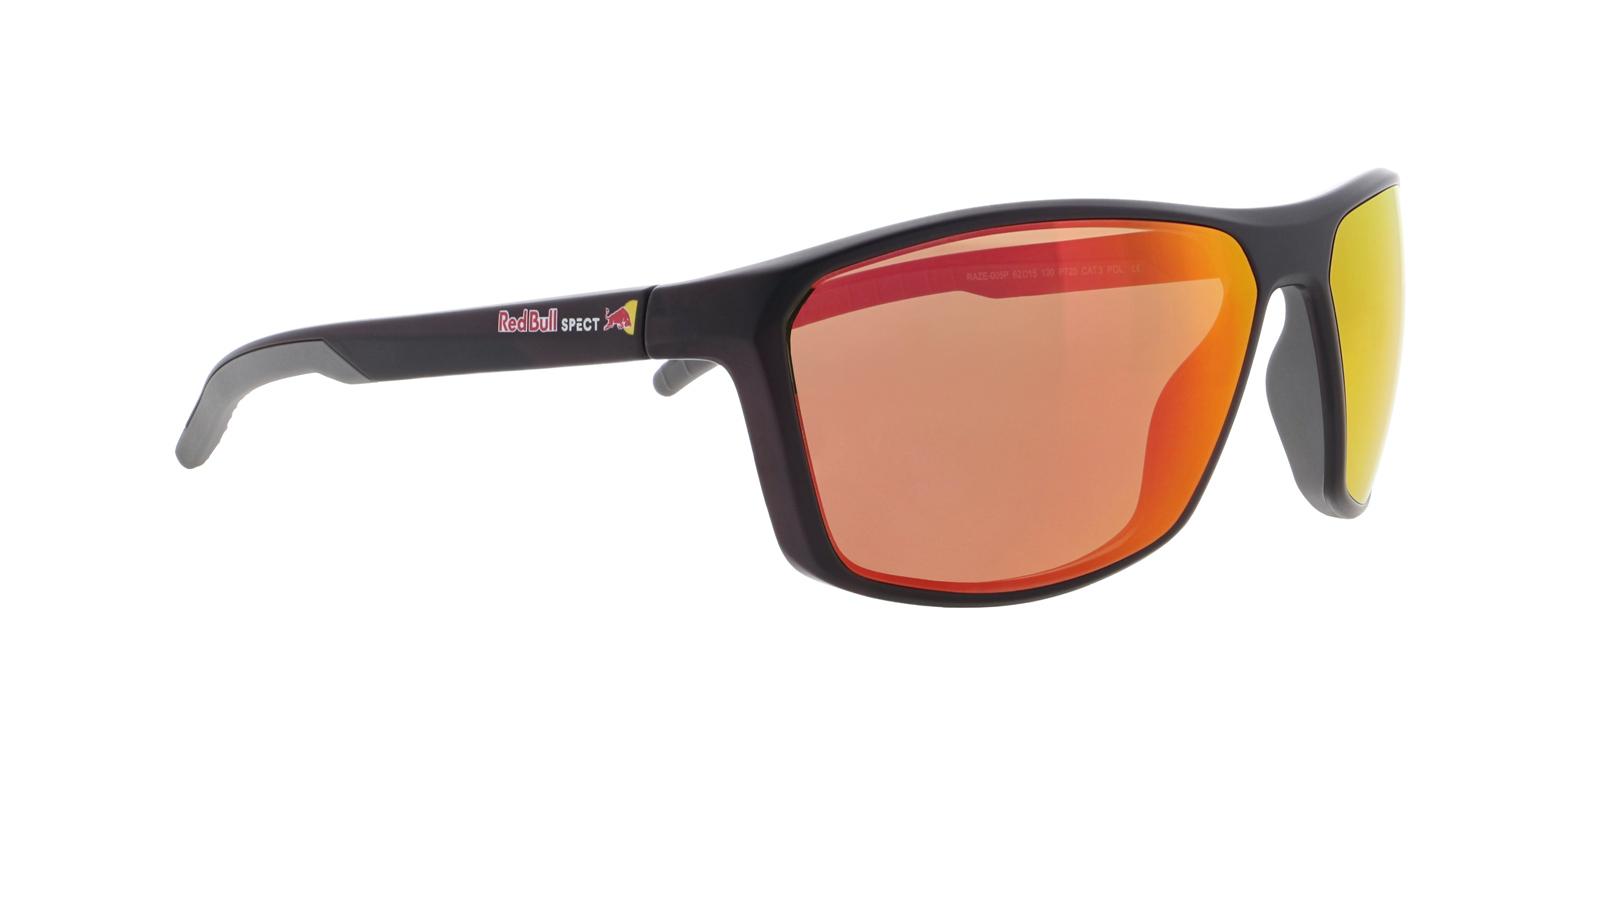 Spect SS21 Sunglasses